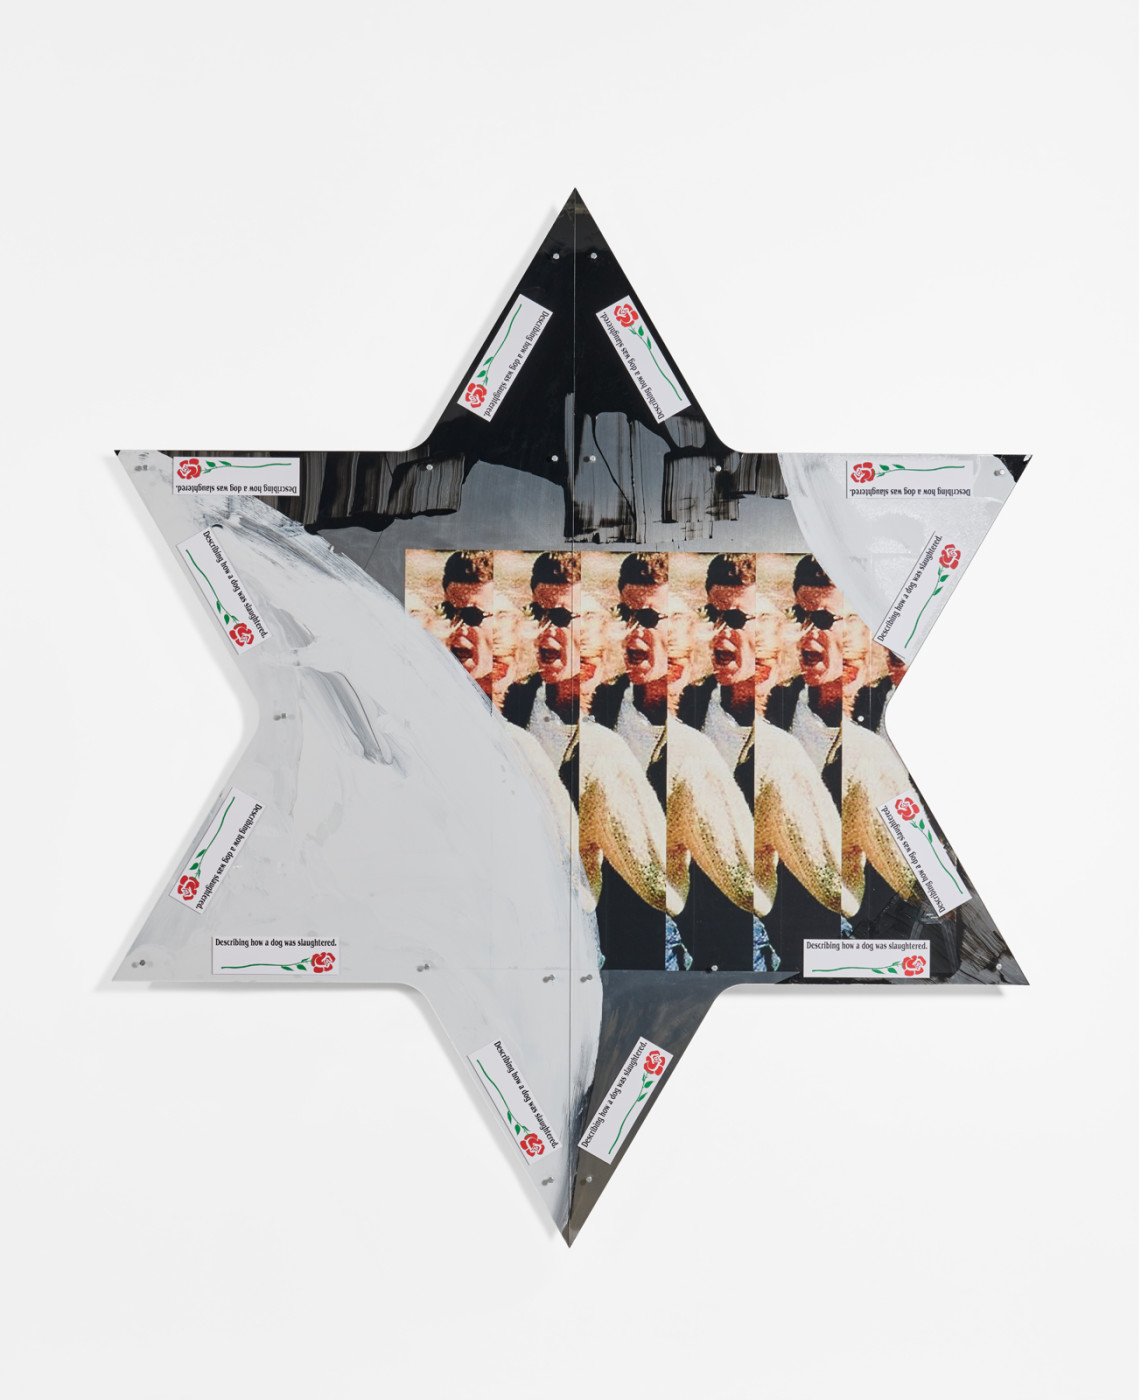 "<div class=""artwork_caption""><p><em>Untitled</em>, 2019<br />adhesive print with gloss coat and enamel on aluminium panel, acrylic plexi, bumper stickers<br />213.8 x 185.1 cm / 84 ¼ x 72 ⅞ in</p></div>"